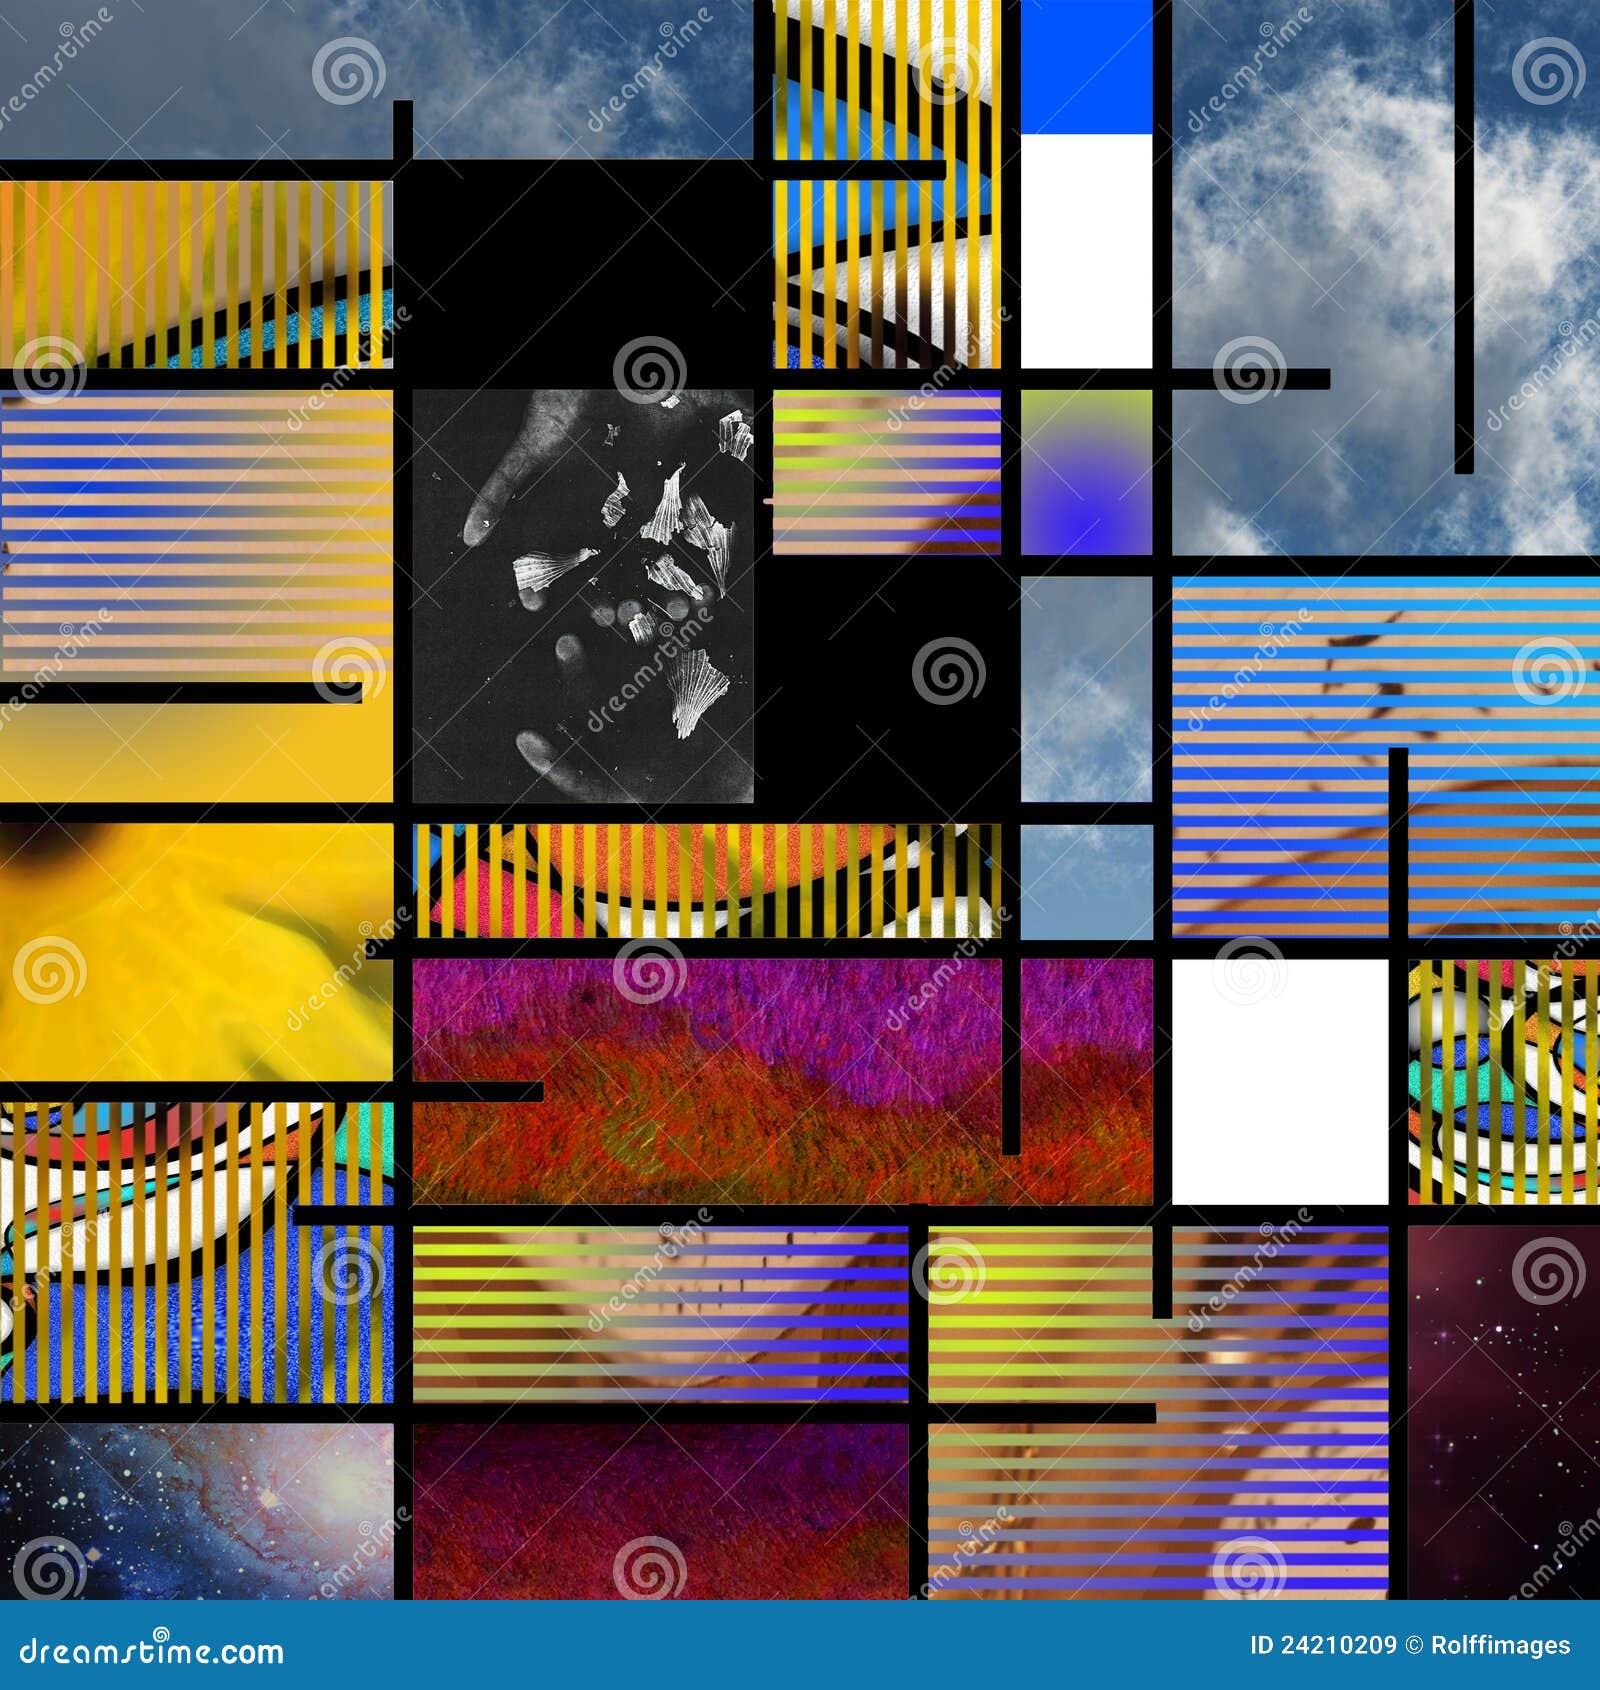 Modern Art based Abstract